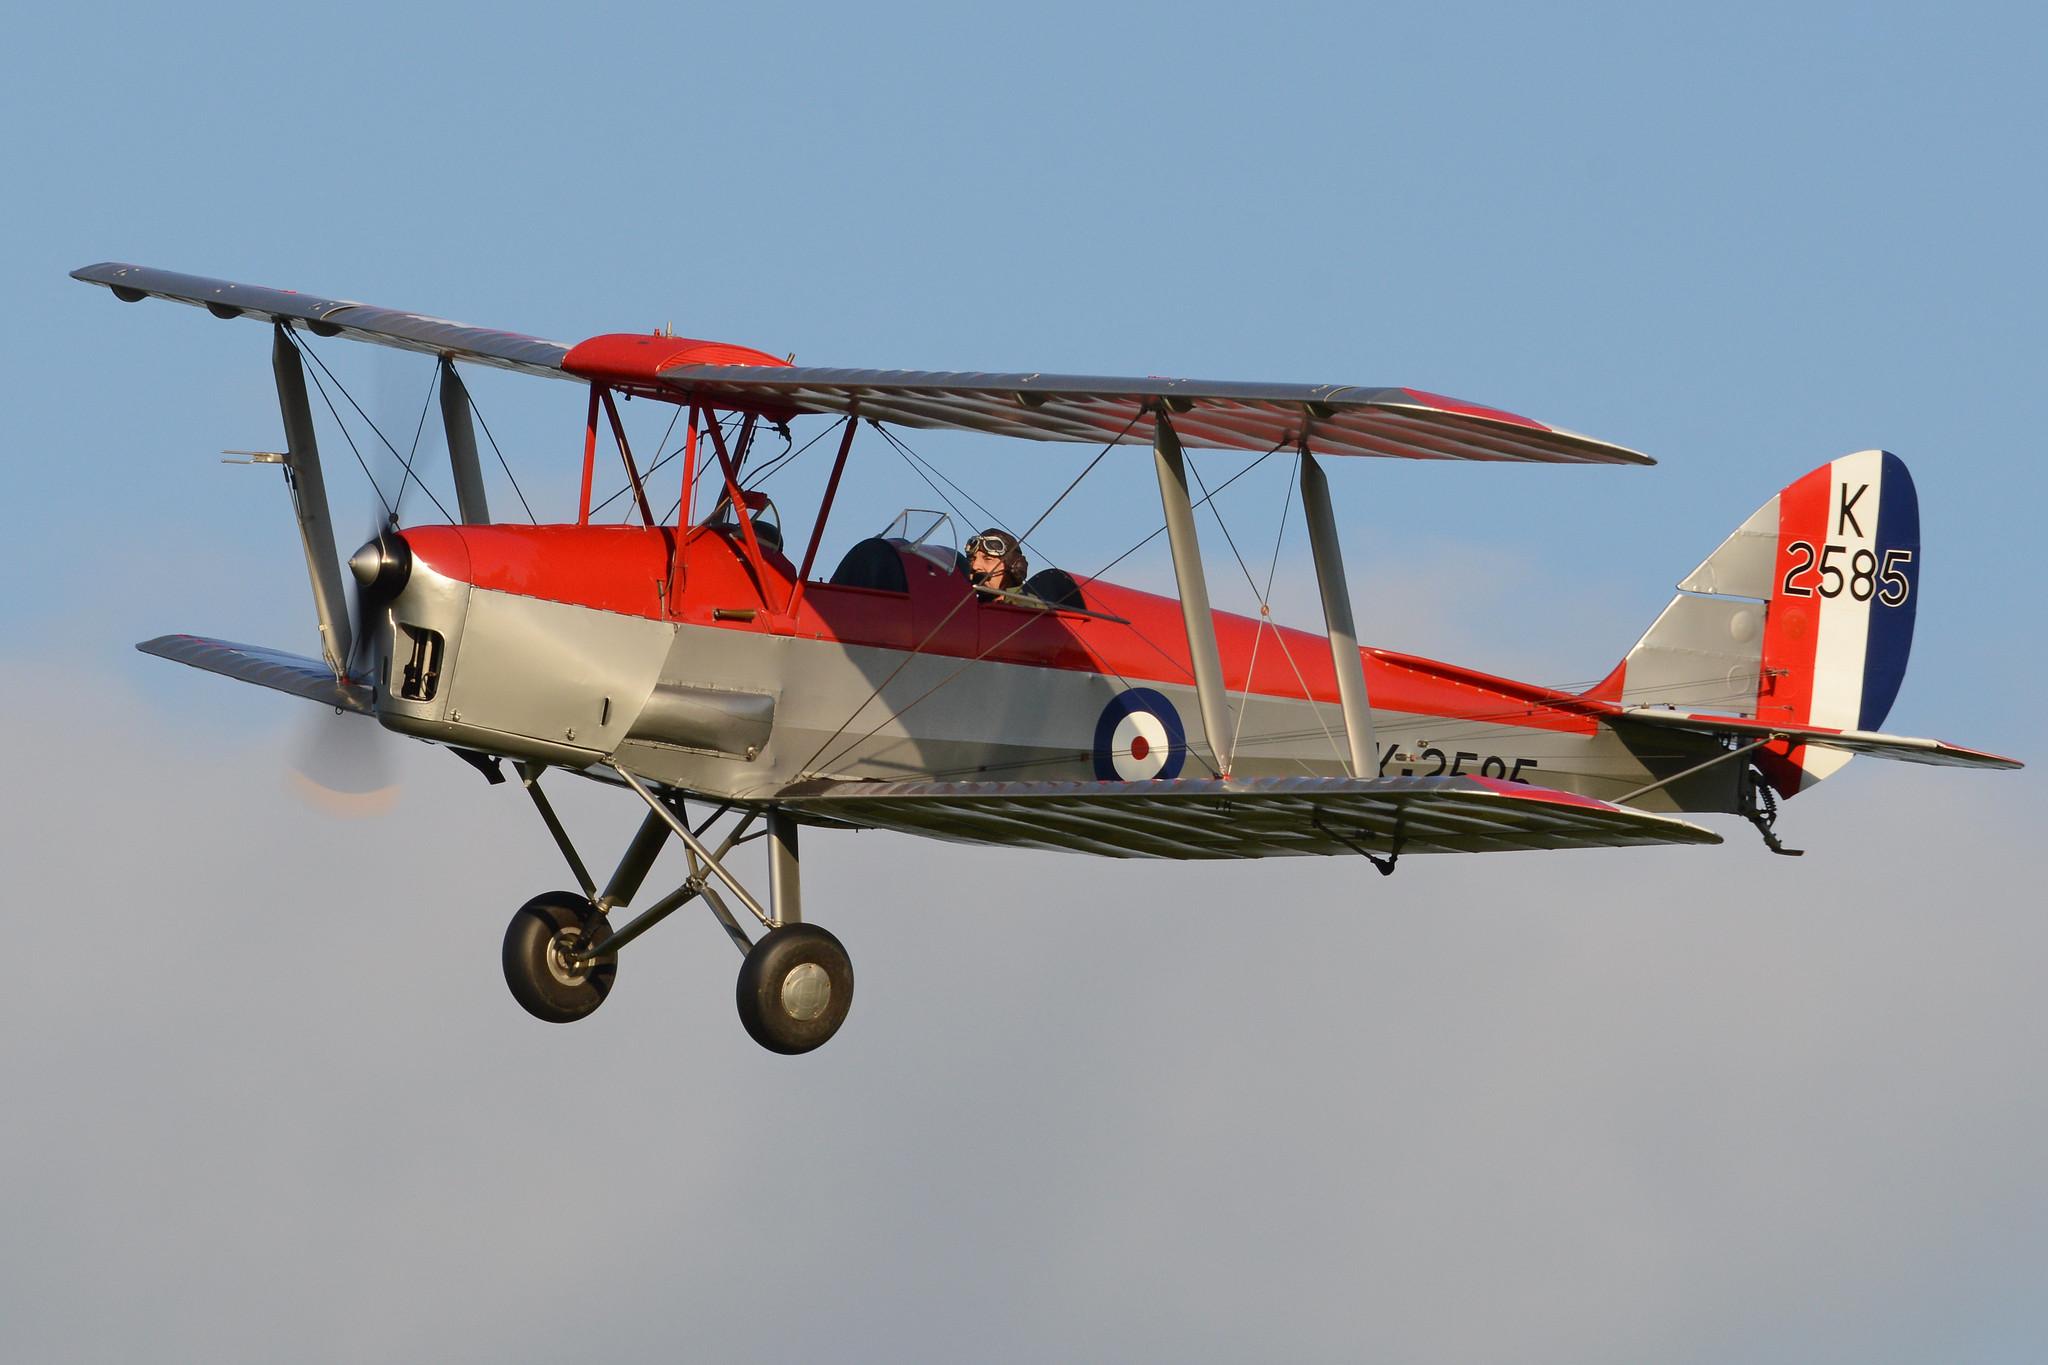 de Havilland DH82A Tiger Moth 'K2585' (G-ANKT)